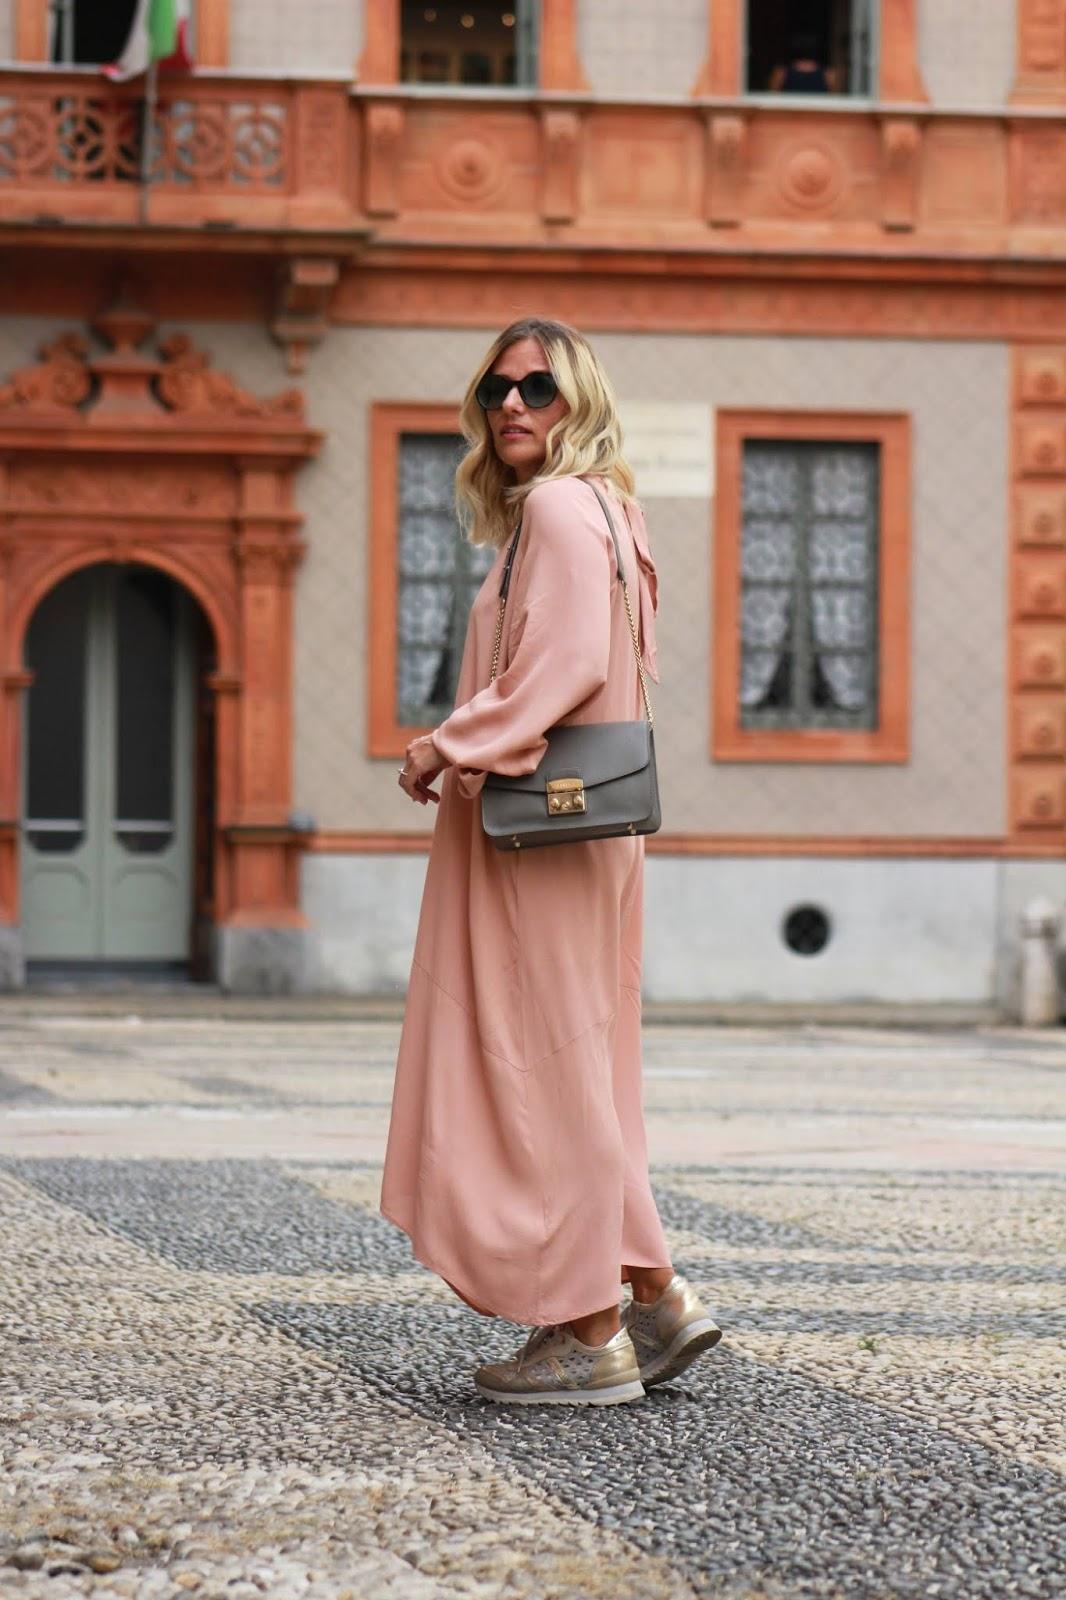 Eniwhere Fashion - MFW18 - Outfit Fashion Week